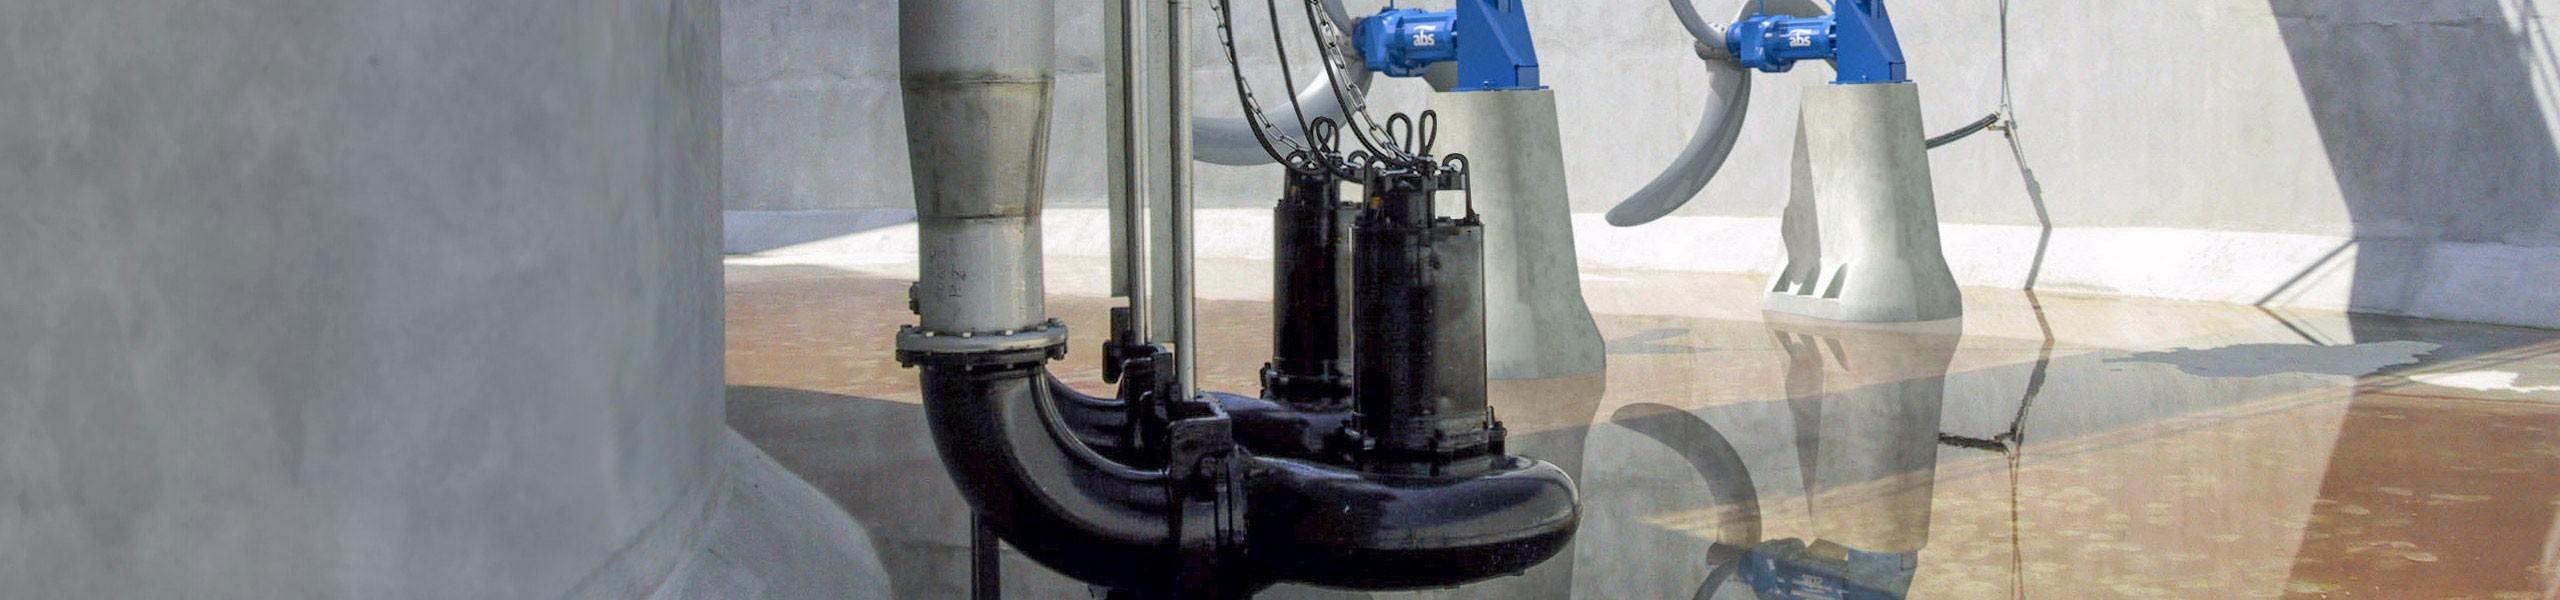 Submersible-pumps-banner-.jpg